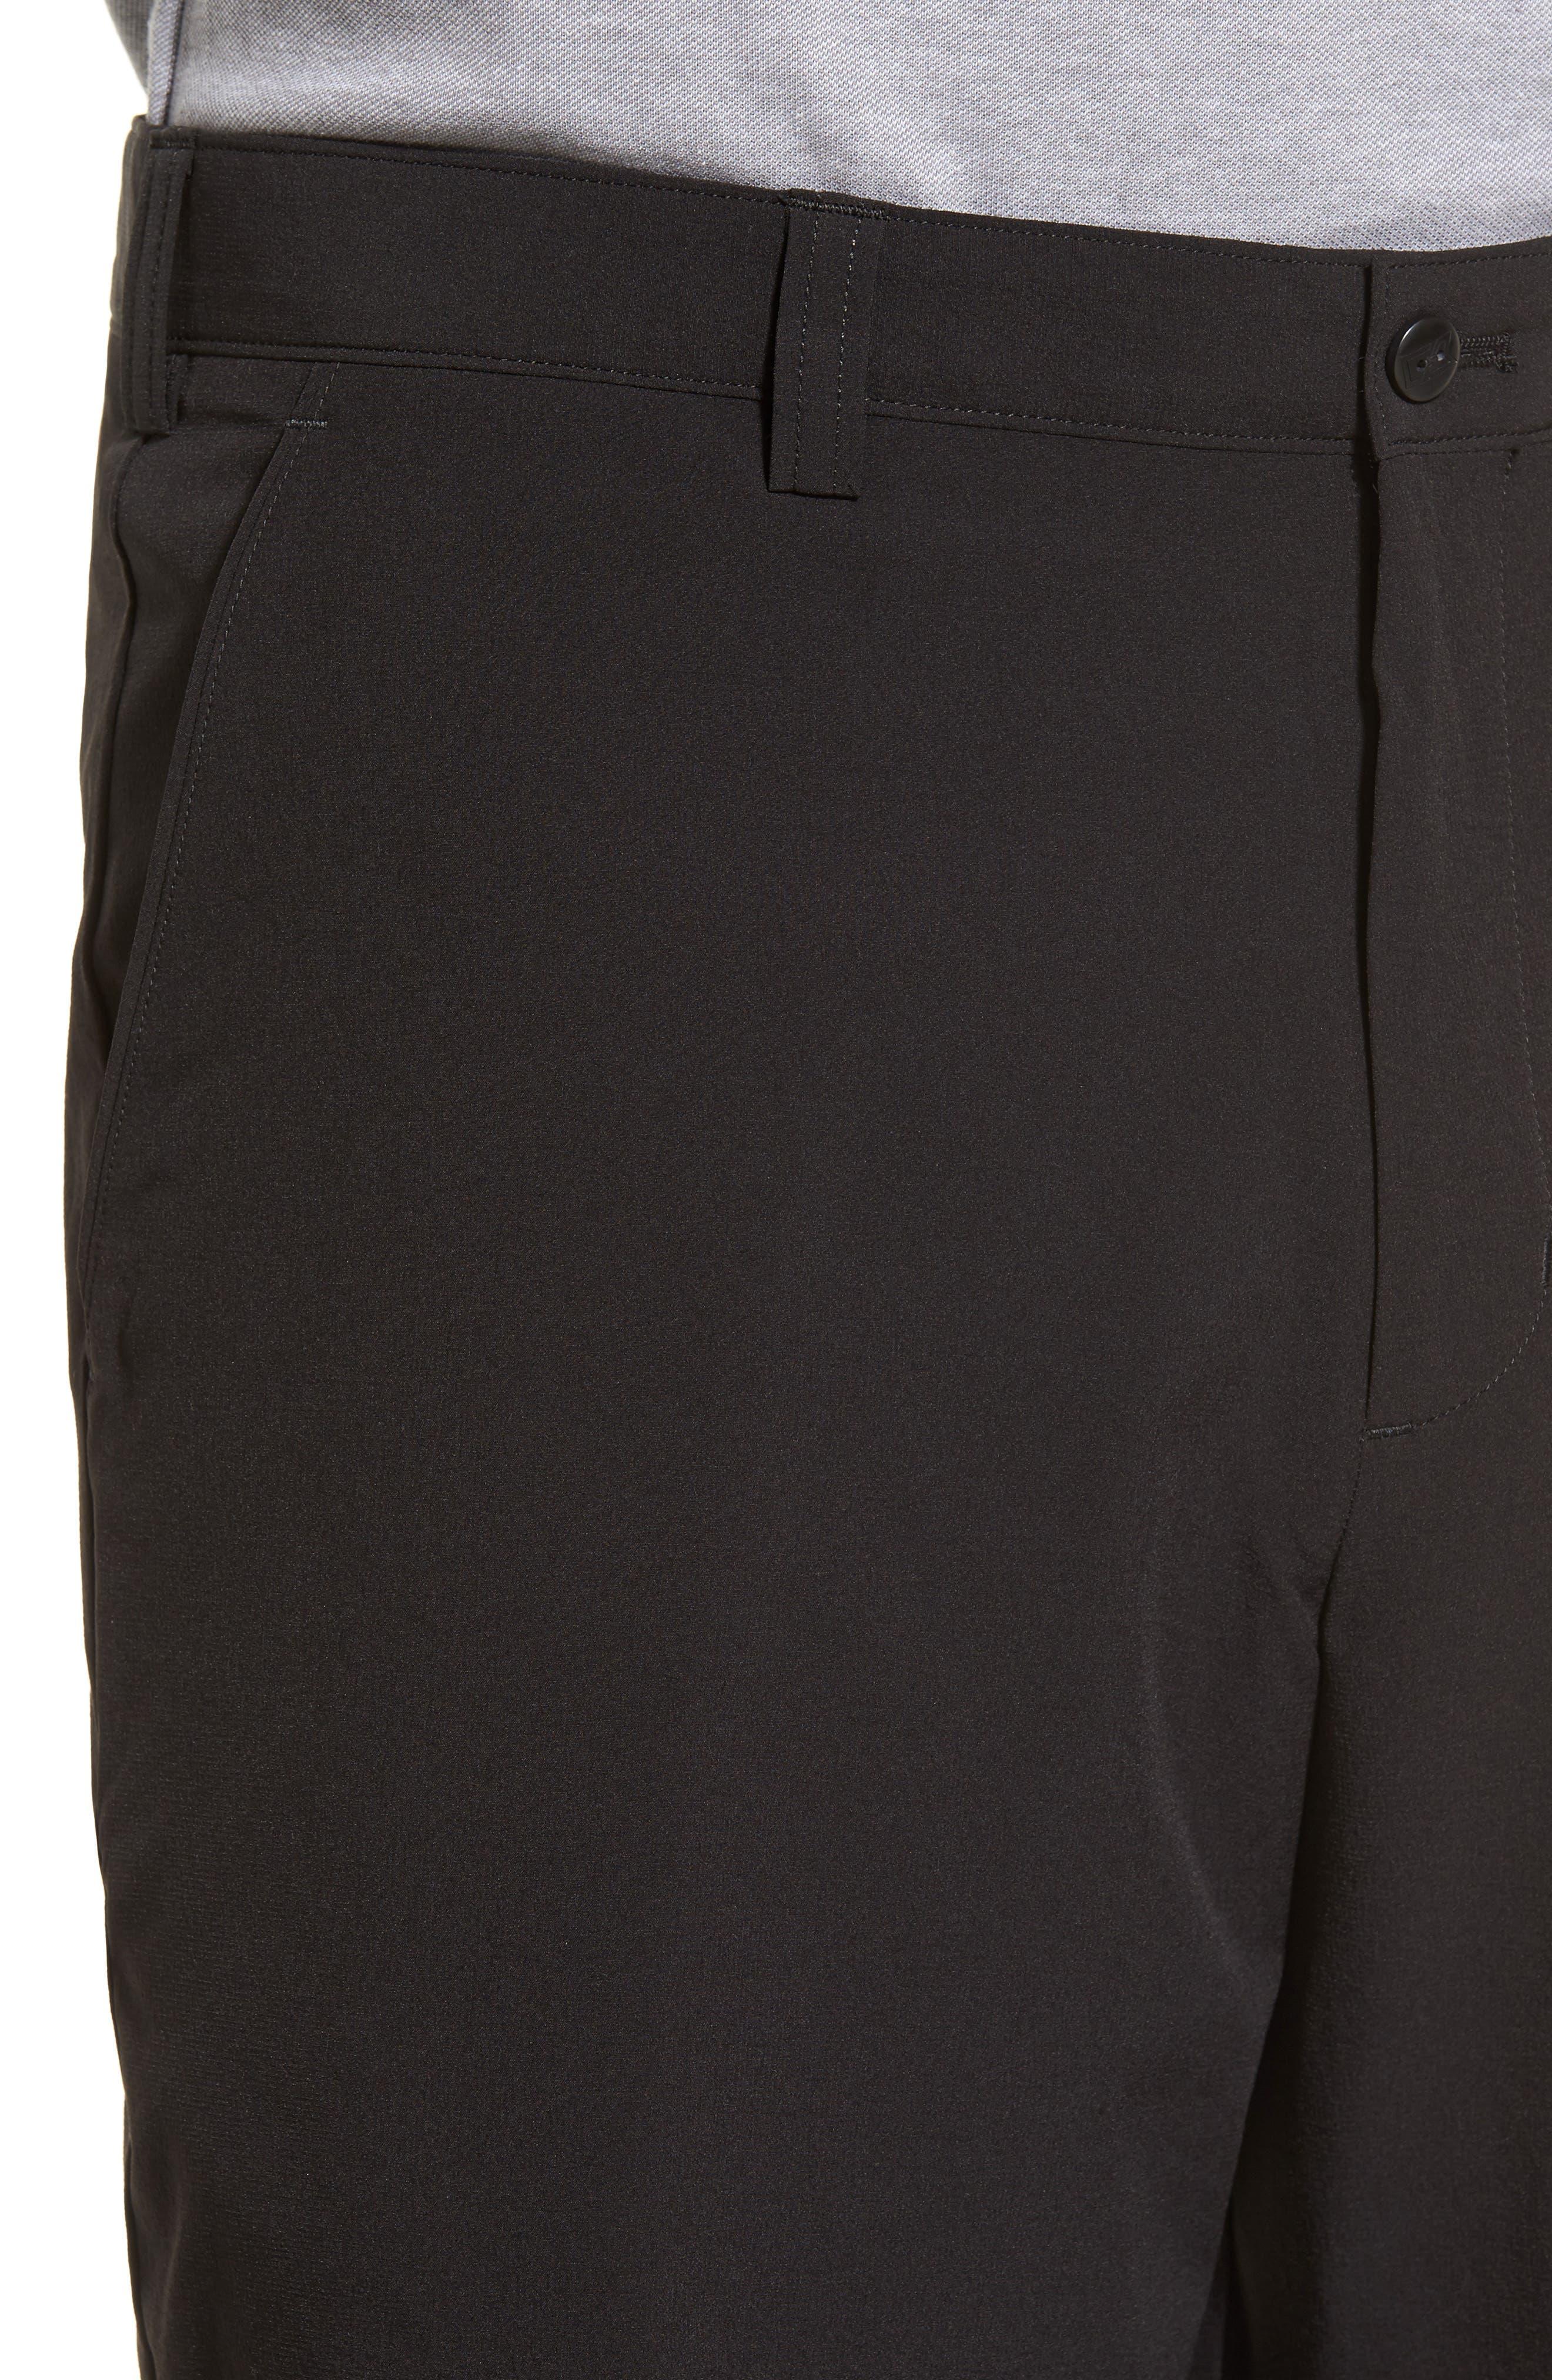 'Bainbridge' DryTec Shorts,                             Alternate thumbnail 2, color,                             001